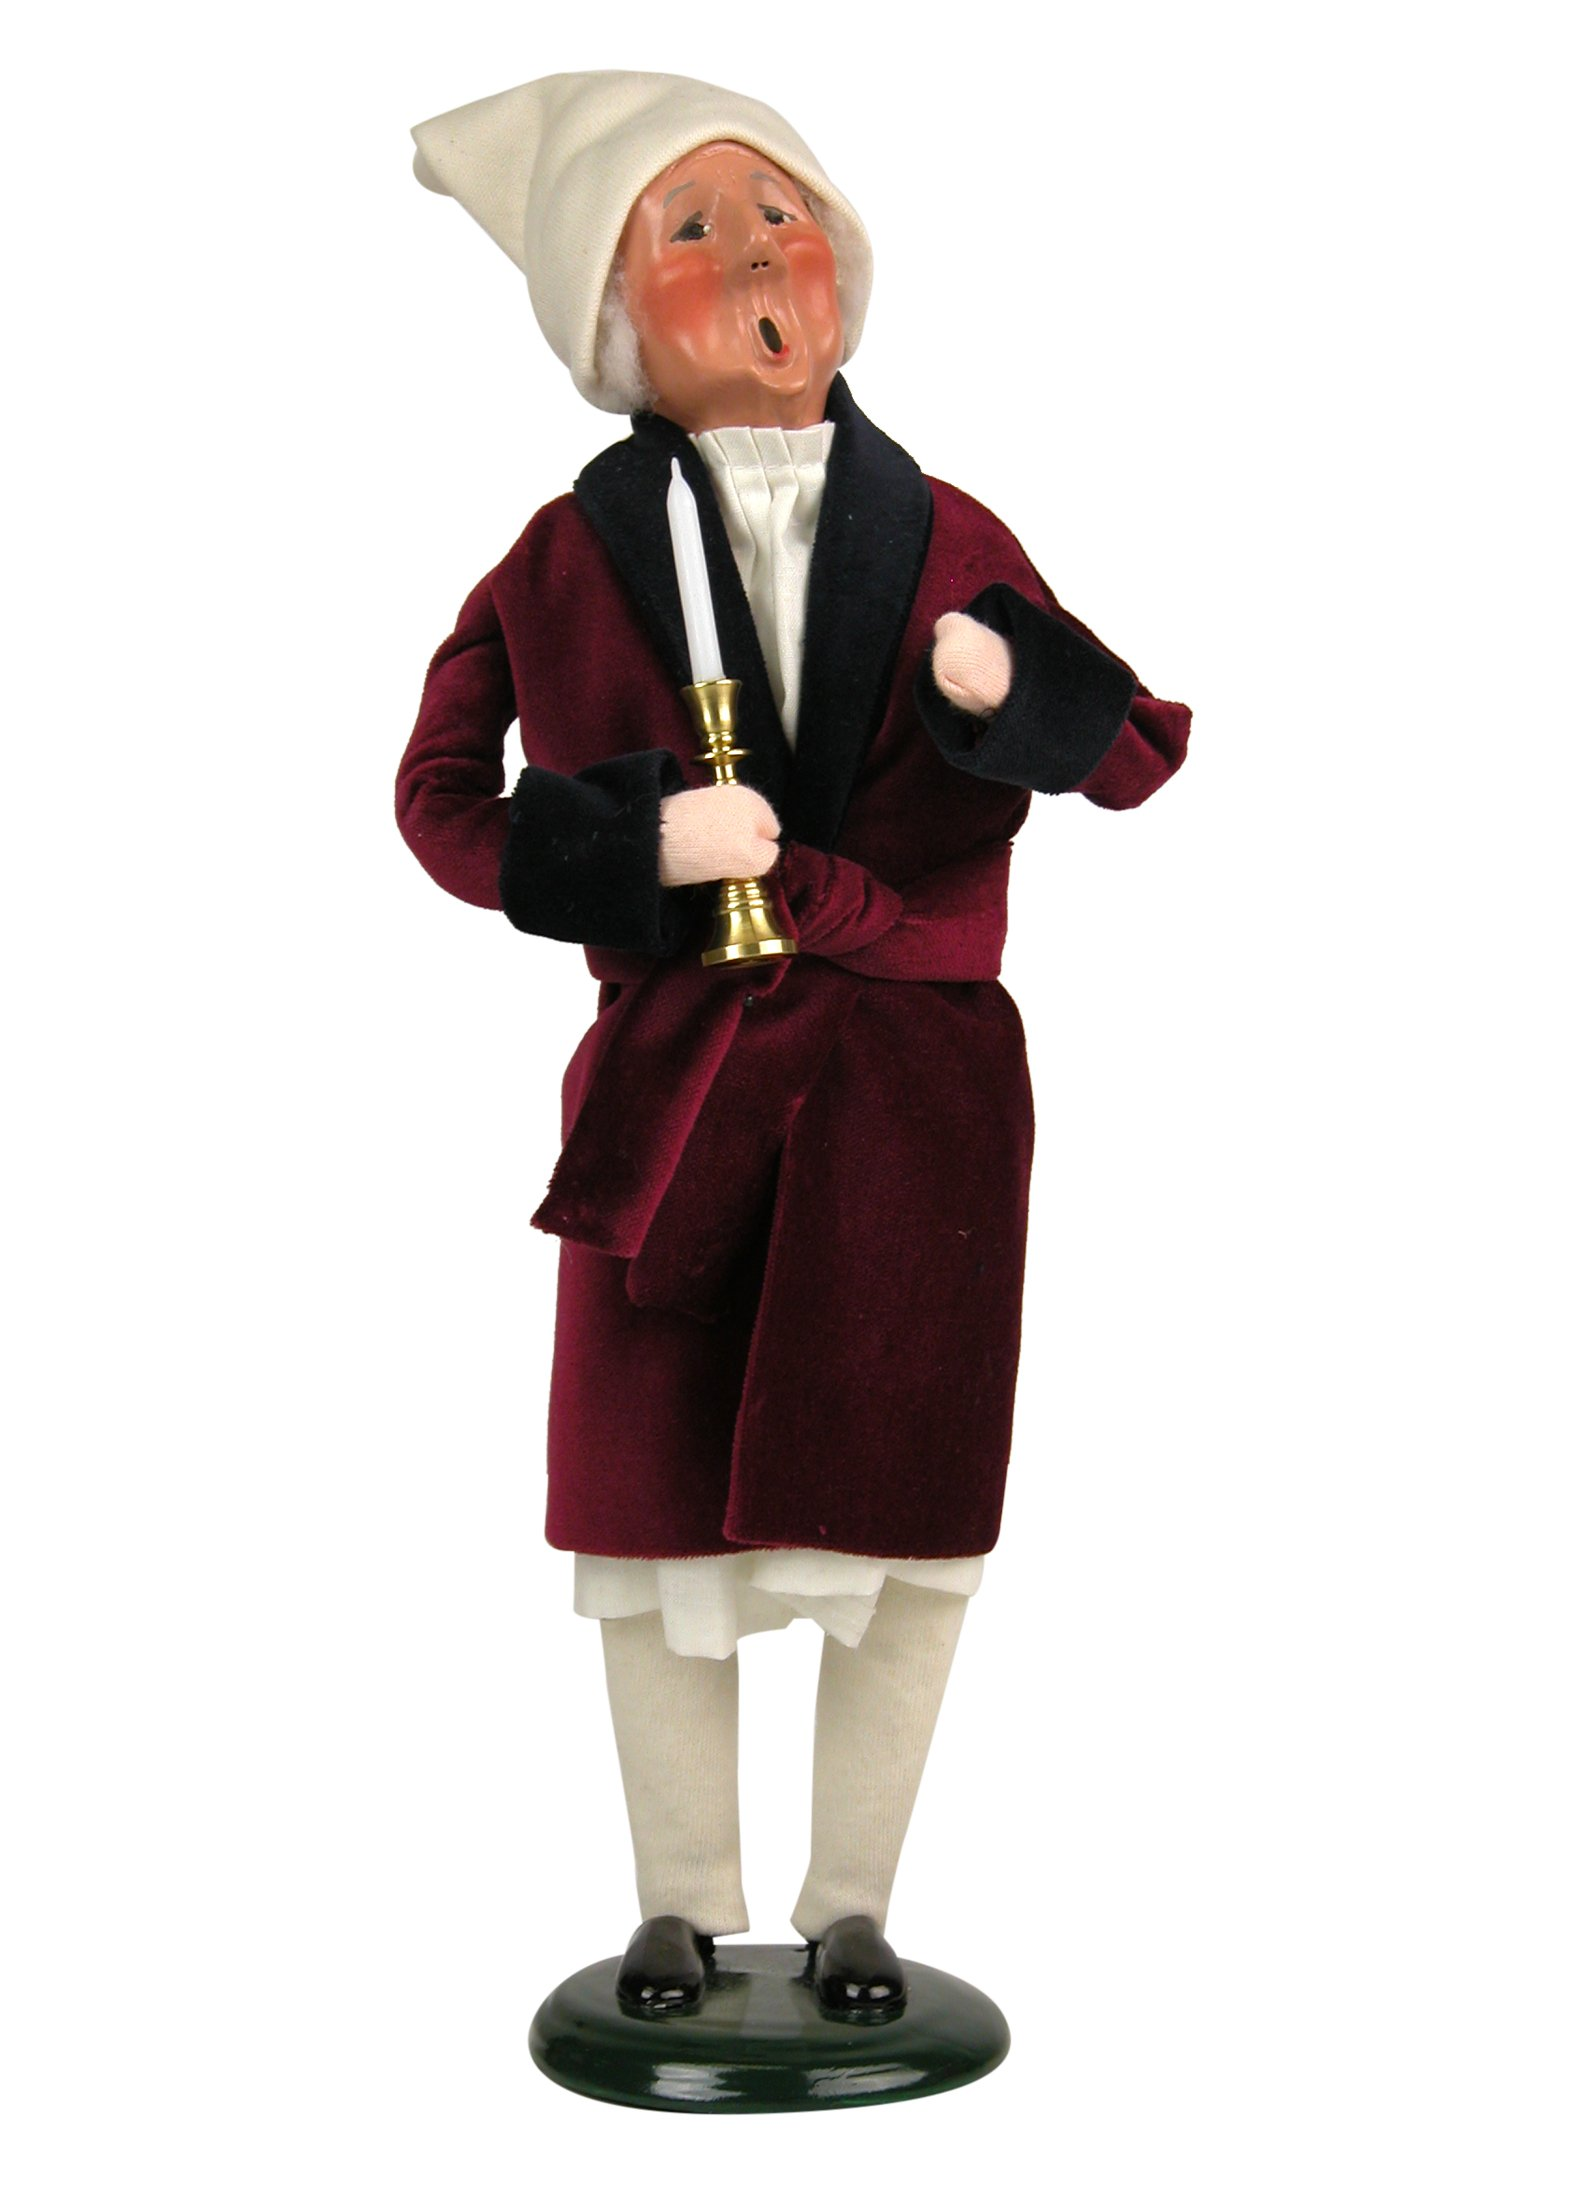 Byers' Choice Scrooge Caroler Figurine #201 from A Christmas Carol